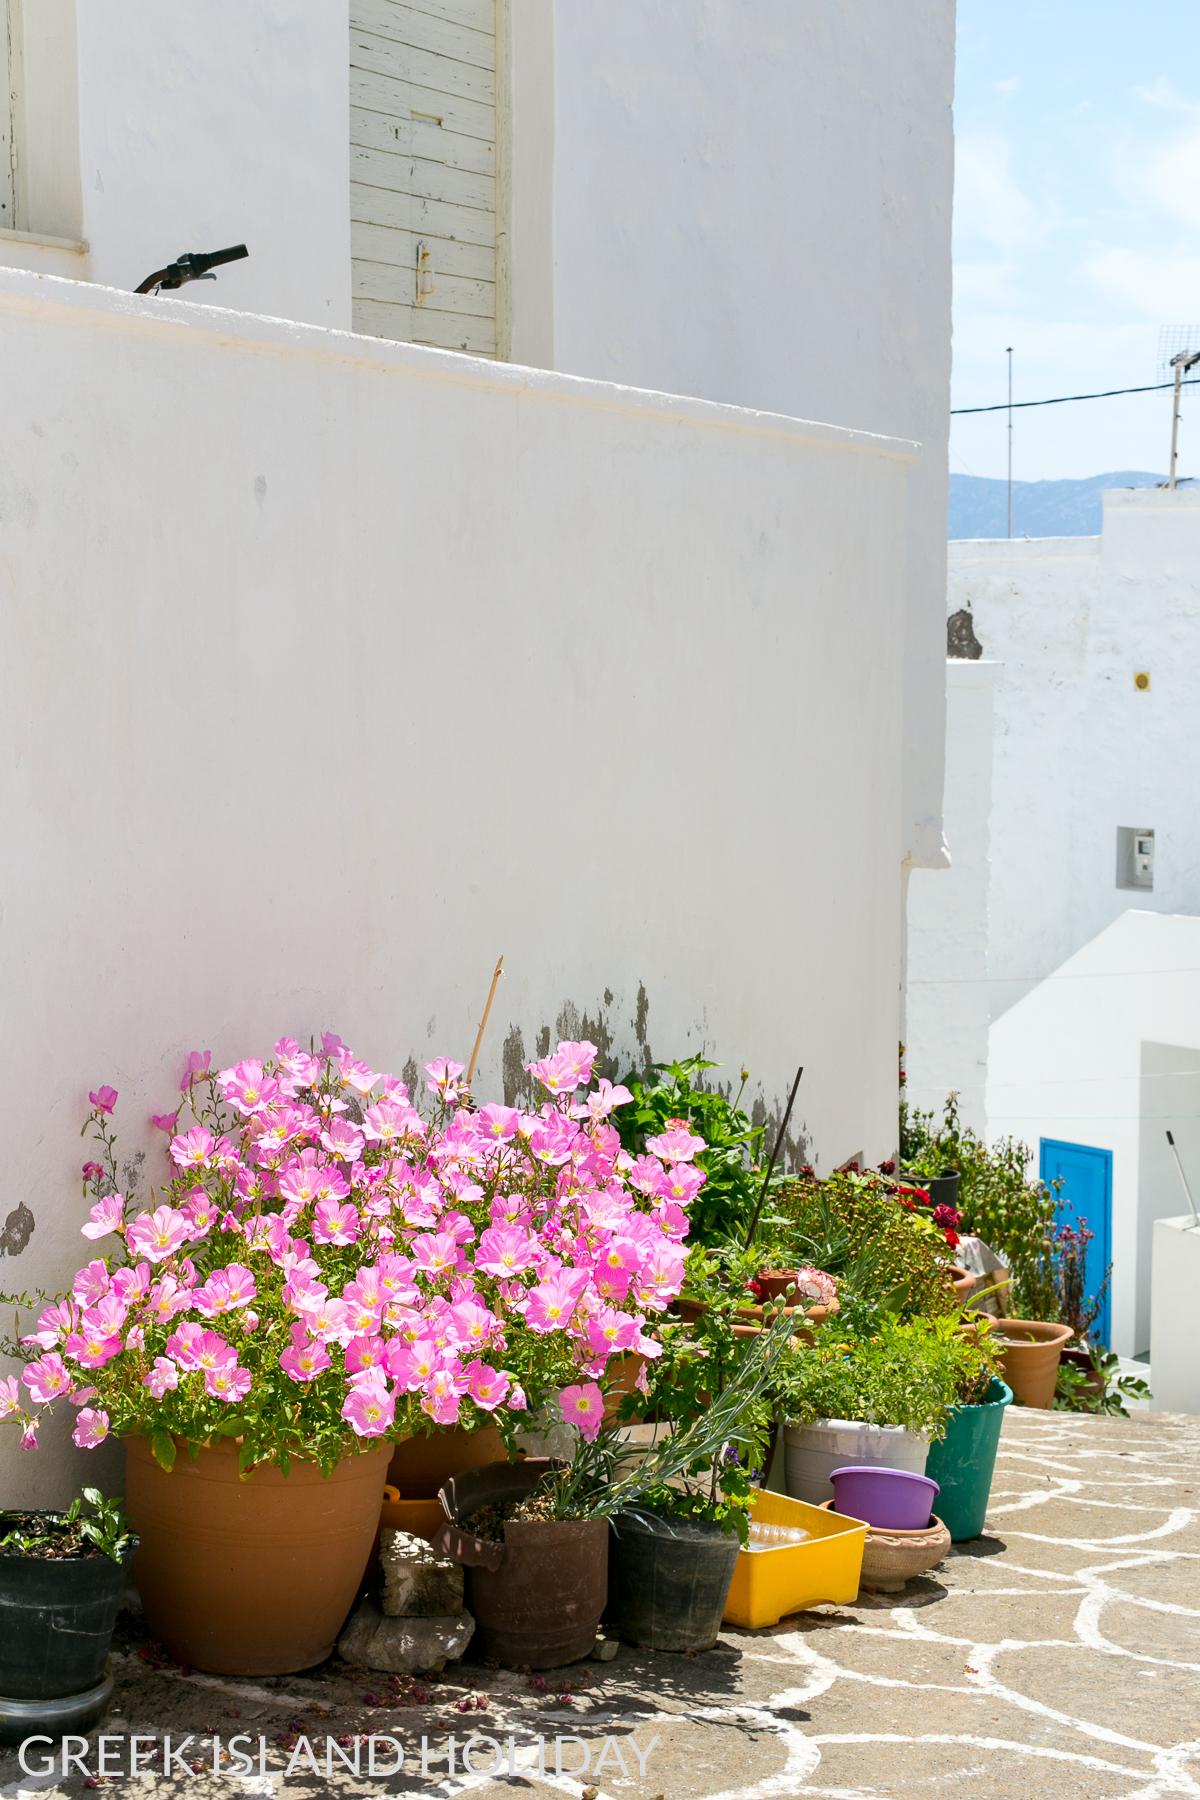 Greek Island Holiday blog Kimolos Chorio pink flowers